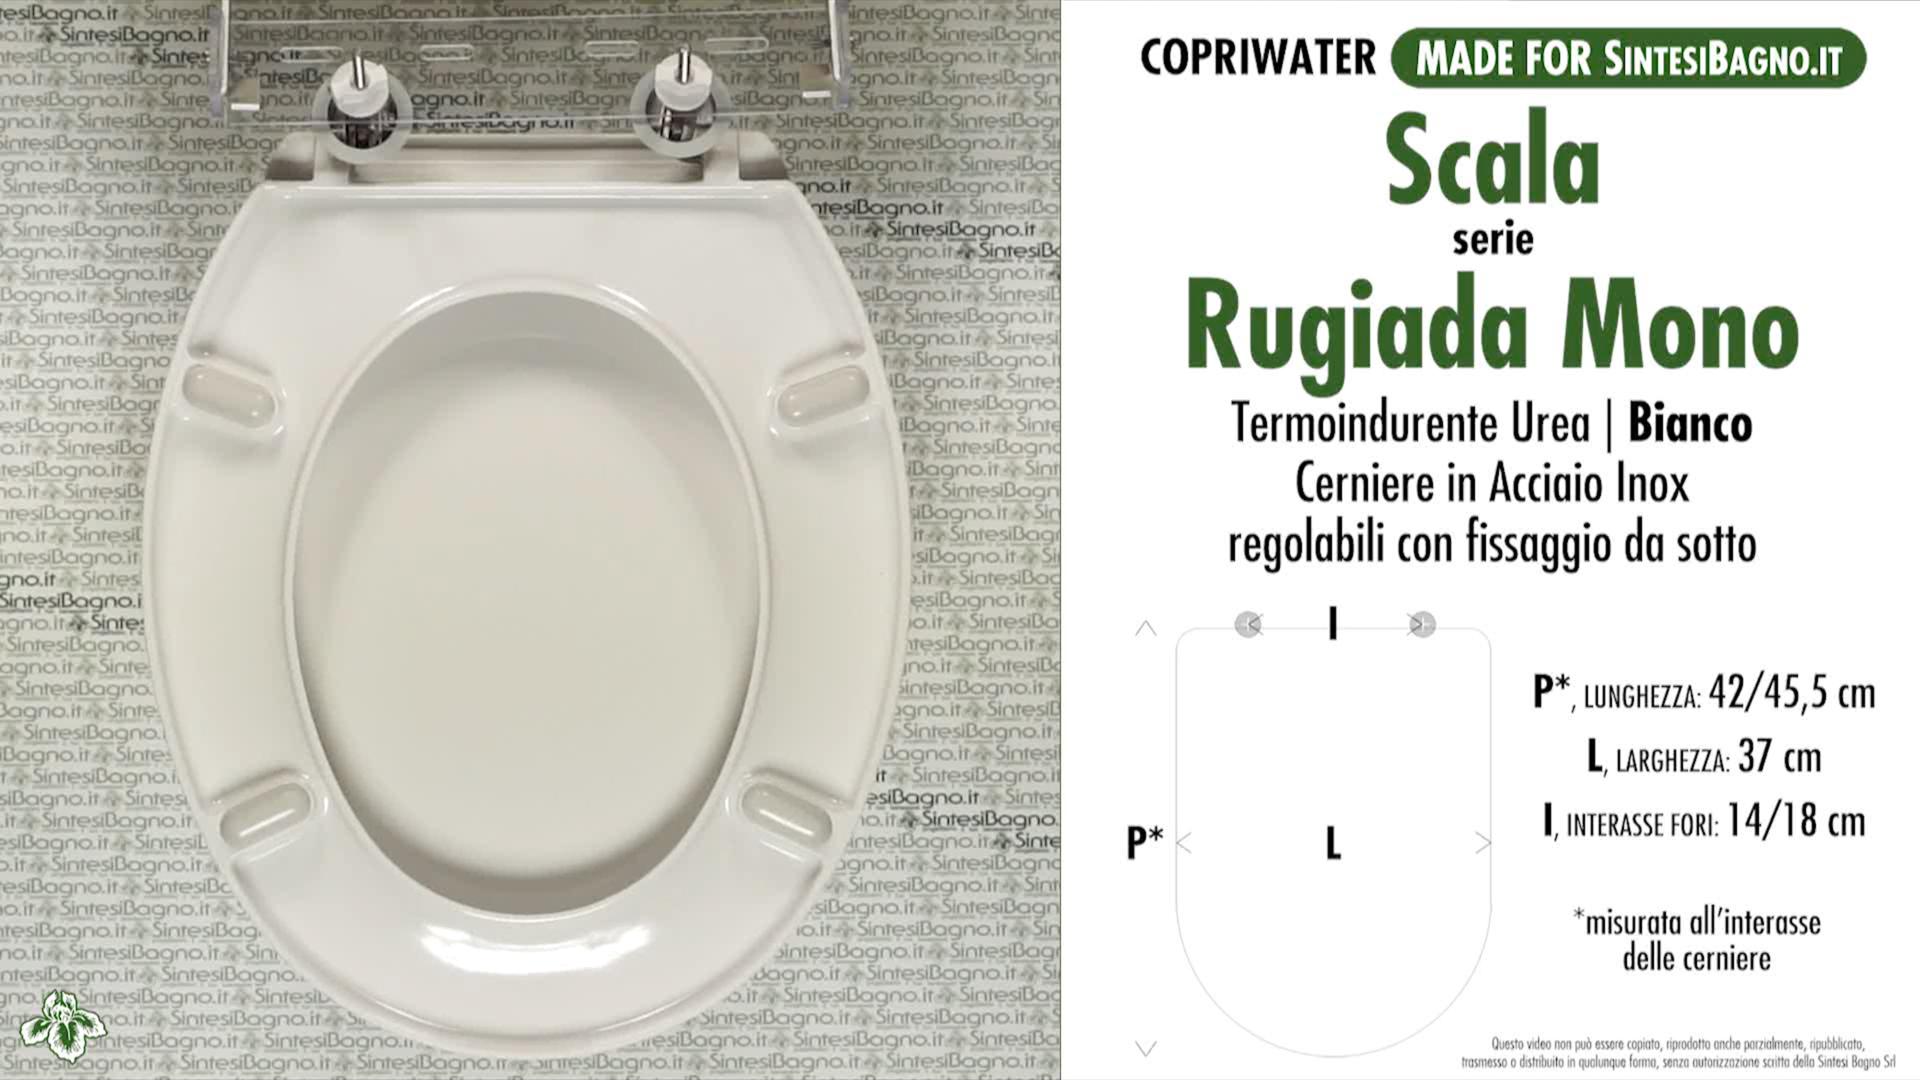 SCHEDA TECNICA MISURE copriwater SCALA RUGIADA